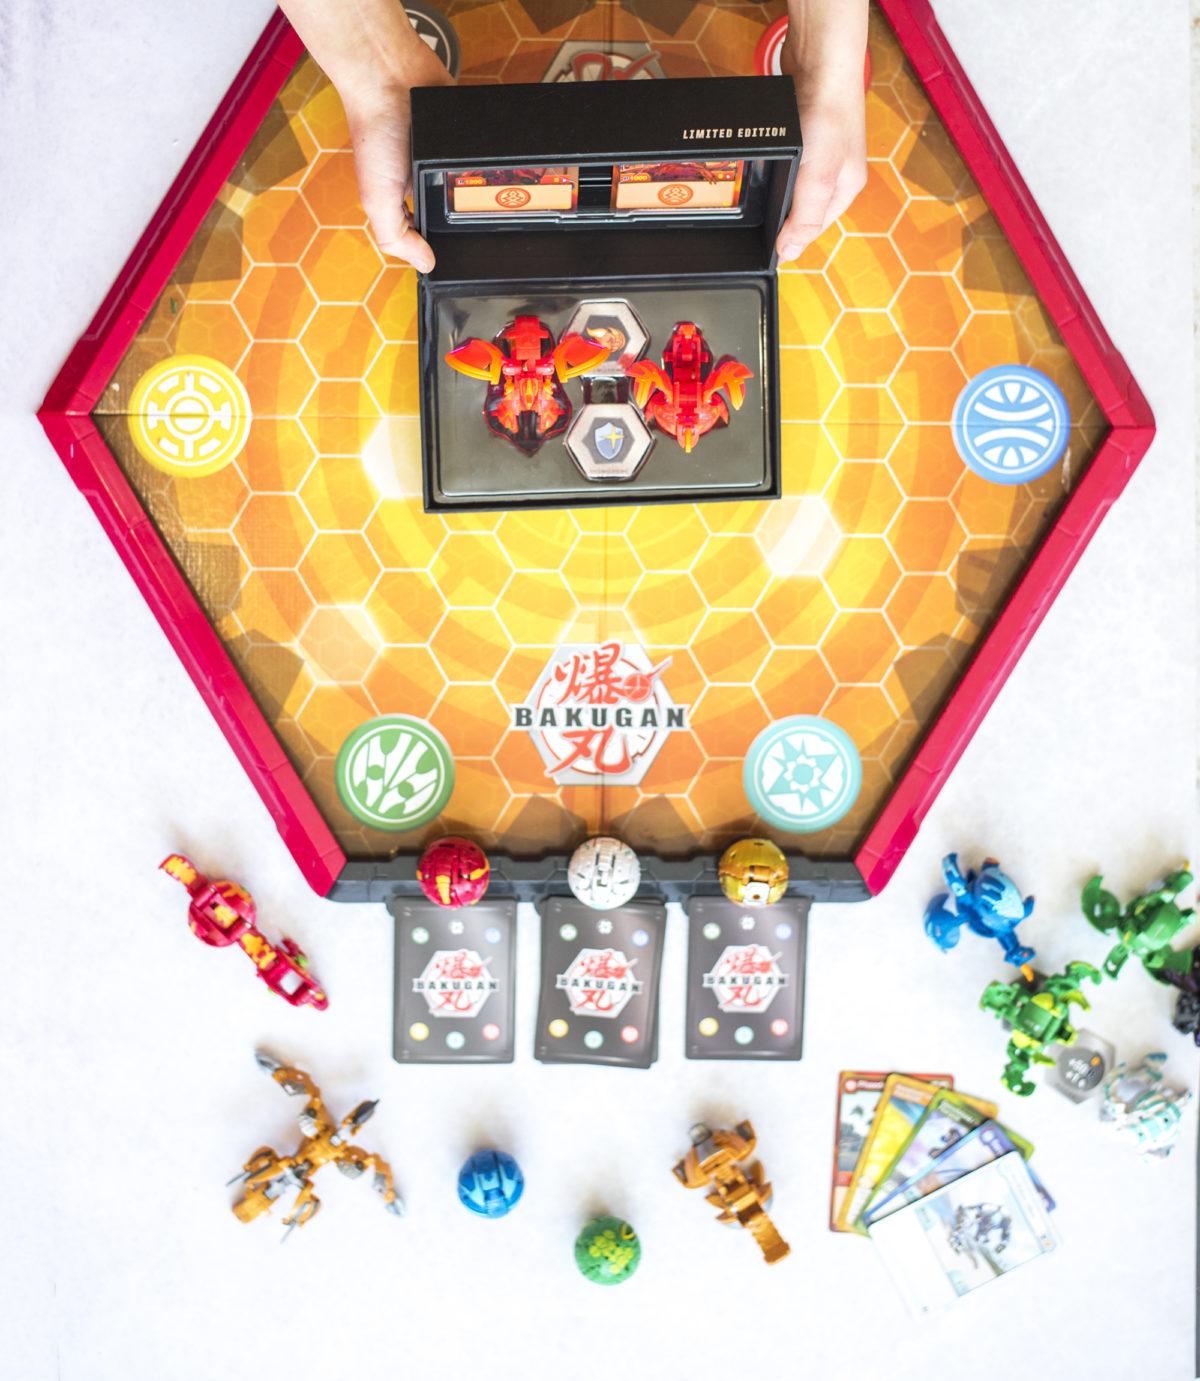 Bakugan BakuCore Bakuballs Collectible toys TV Series